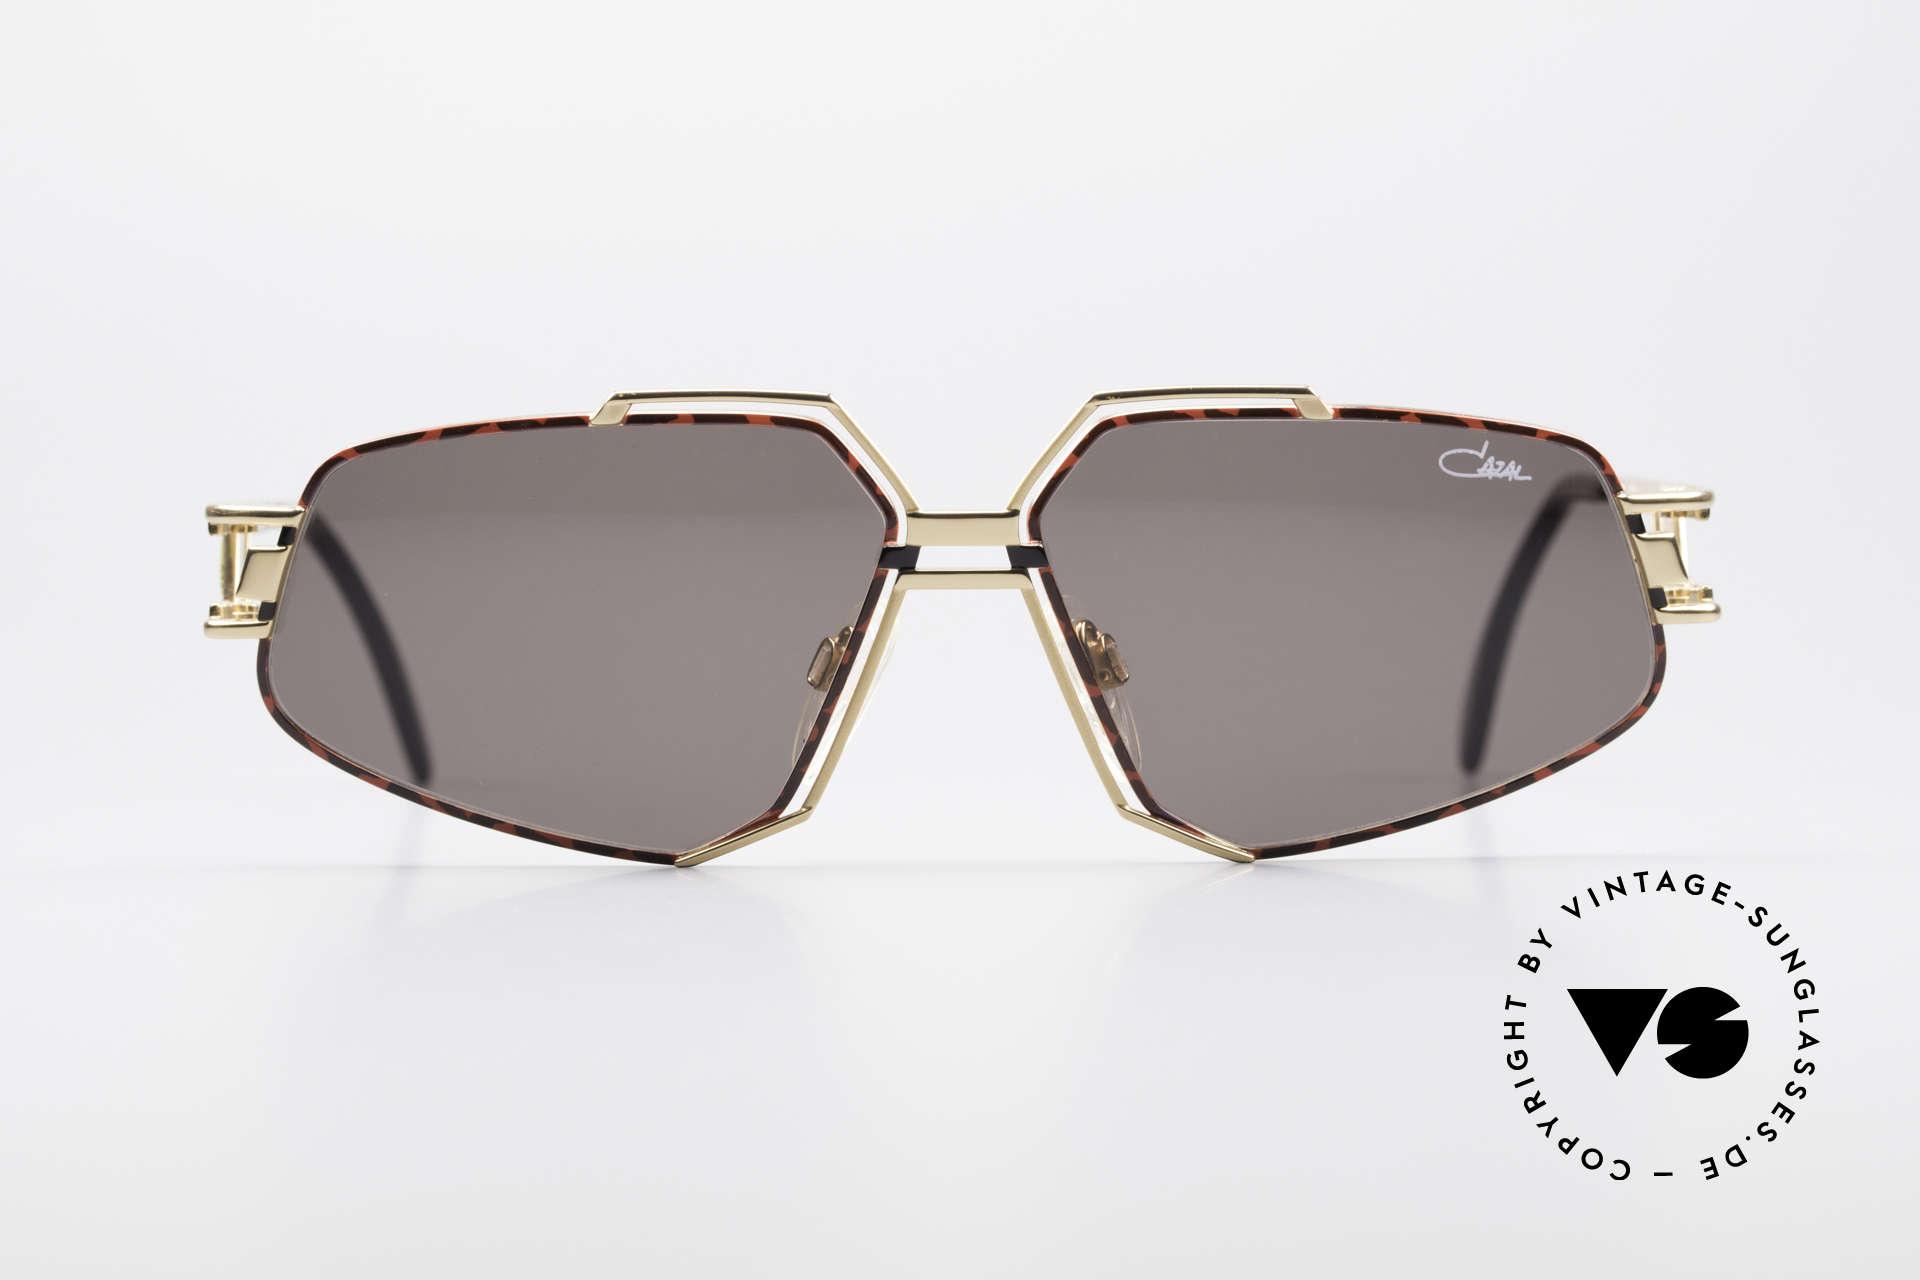 Cazal 961 Designer Vintage Sunglasses, terrific design by CAri ZALloni (CAZAL chief designer), Made for Men and Women